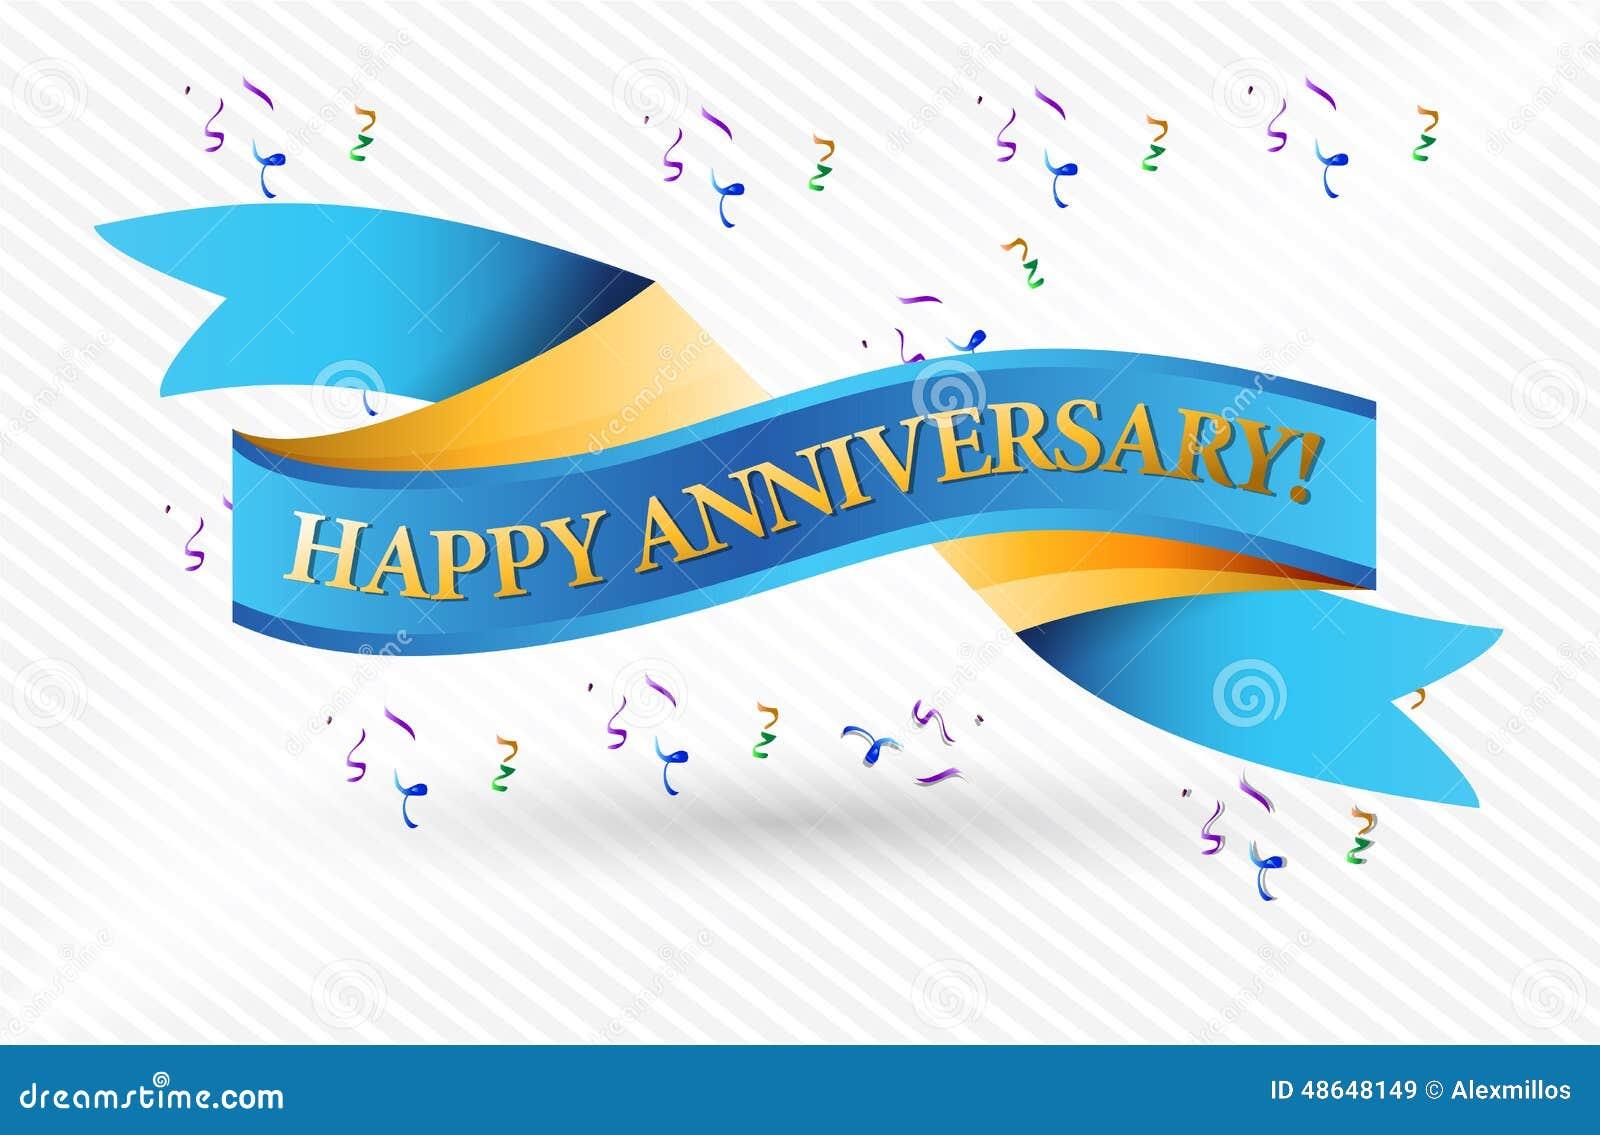 Happy Anniversary Blue Ribbon Illustration Stock Illustration - Image ...